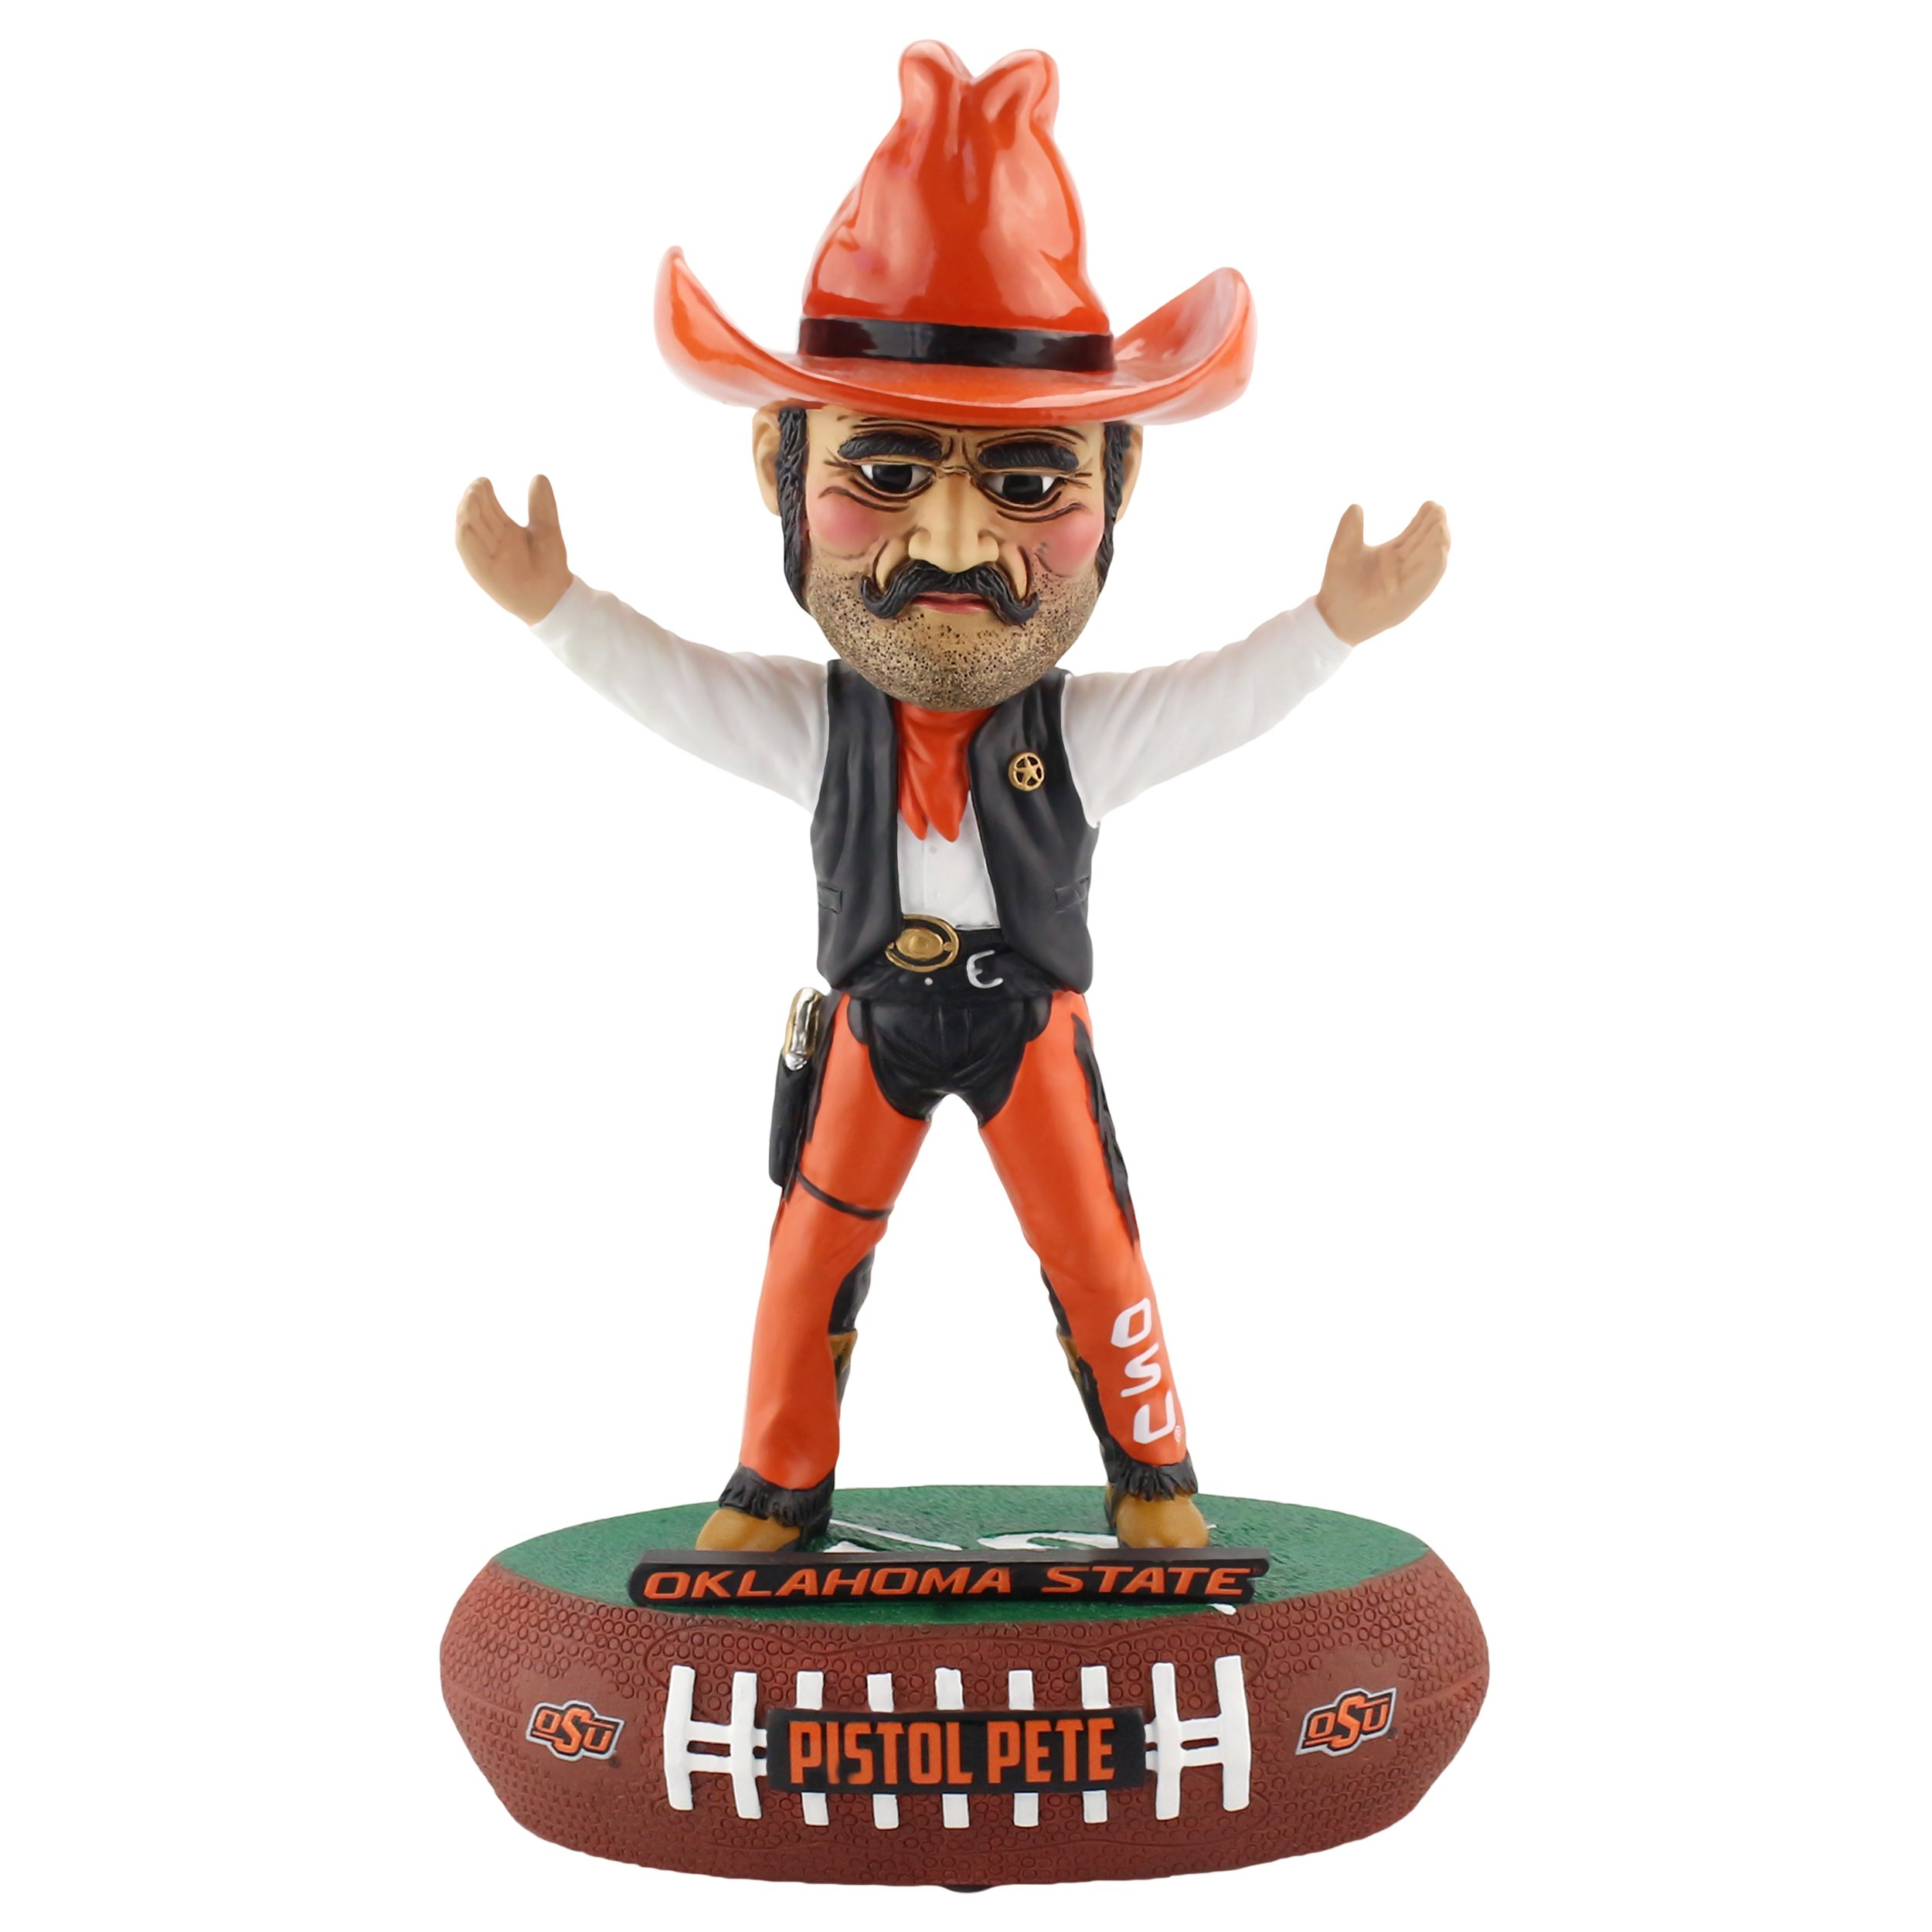 oklahoma state cowboys mascot pistol pete baller special edition